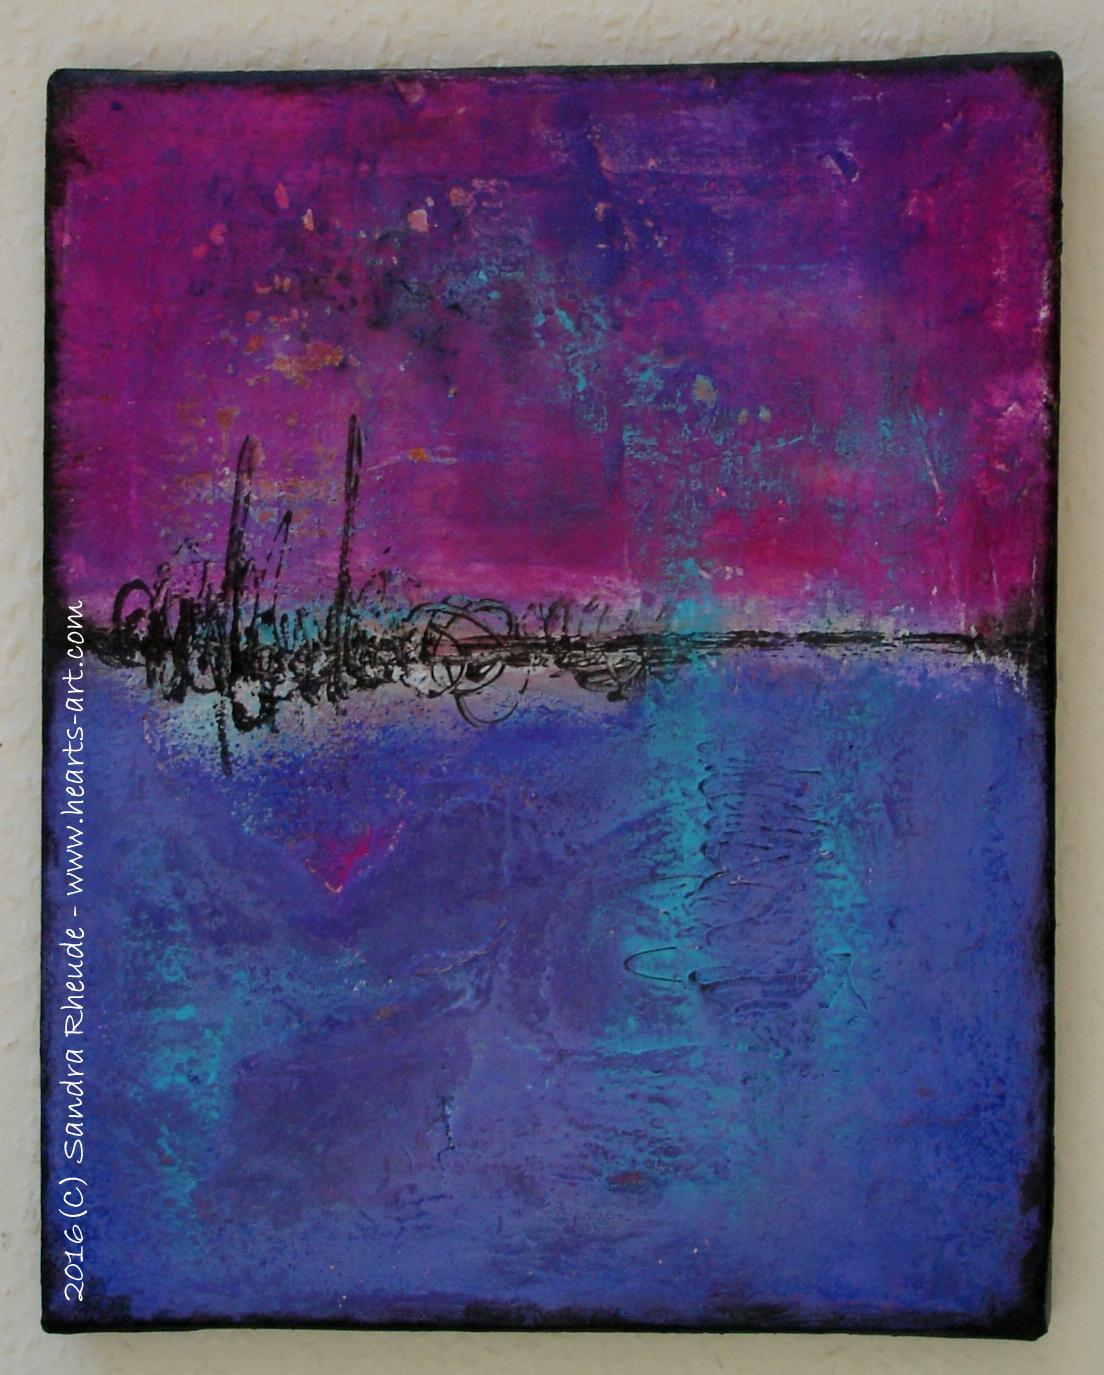 'Still talking about you' - 2016/25 - Acryl/MixedMedia auf Leinwand - 24 x 30 cm - € 130